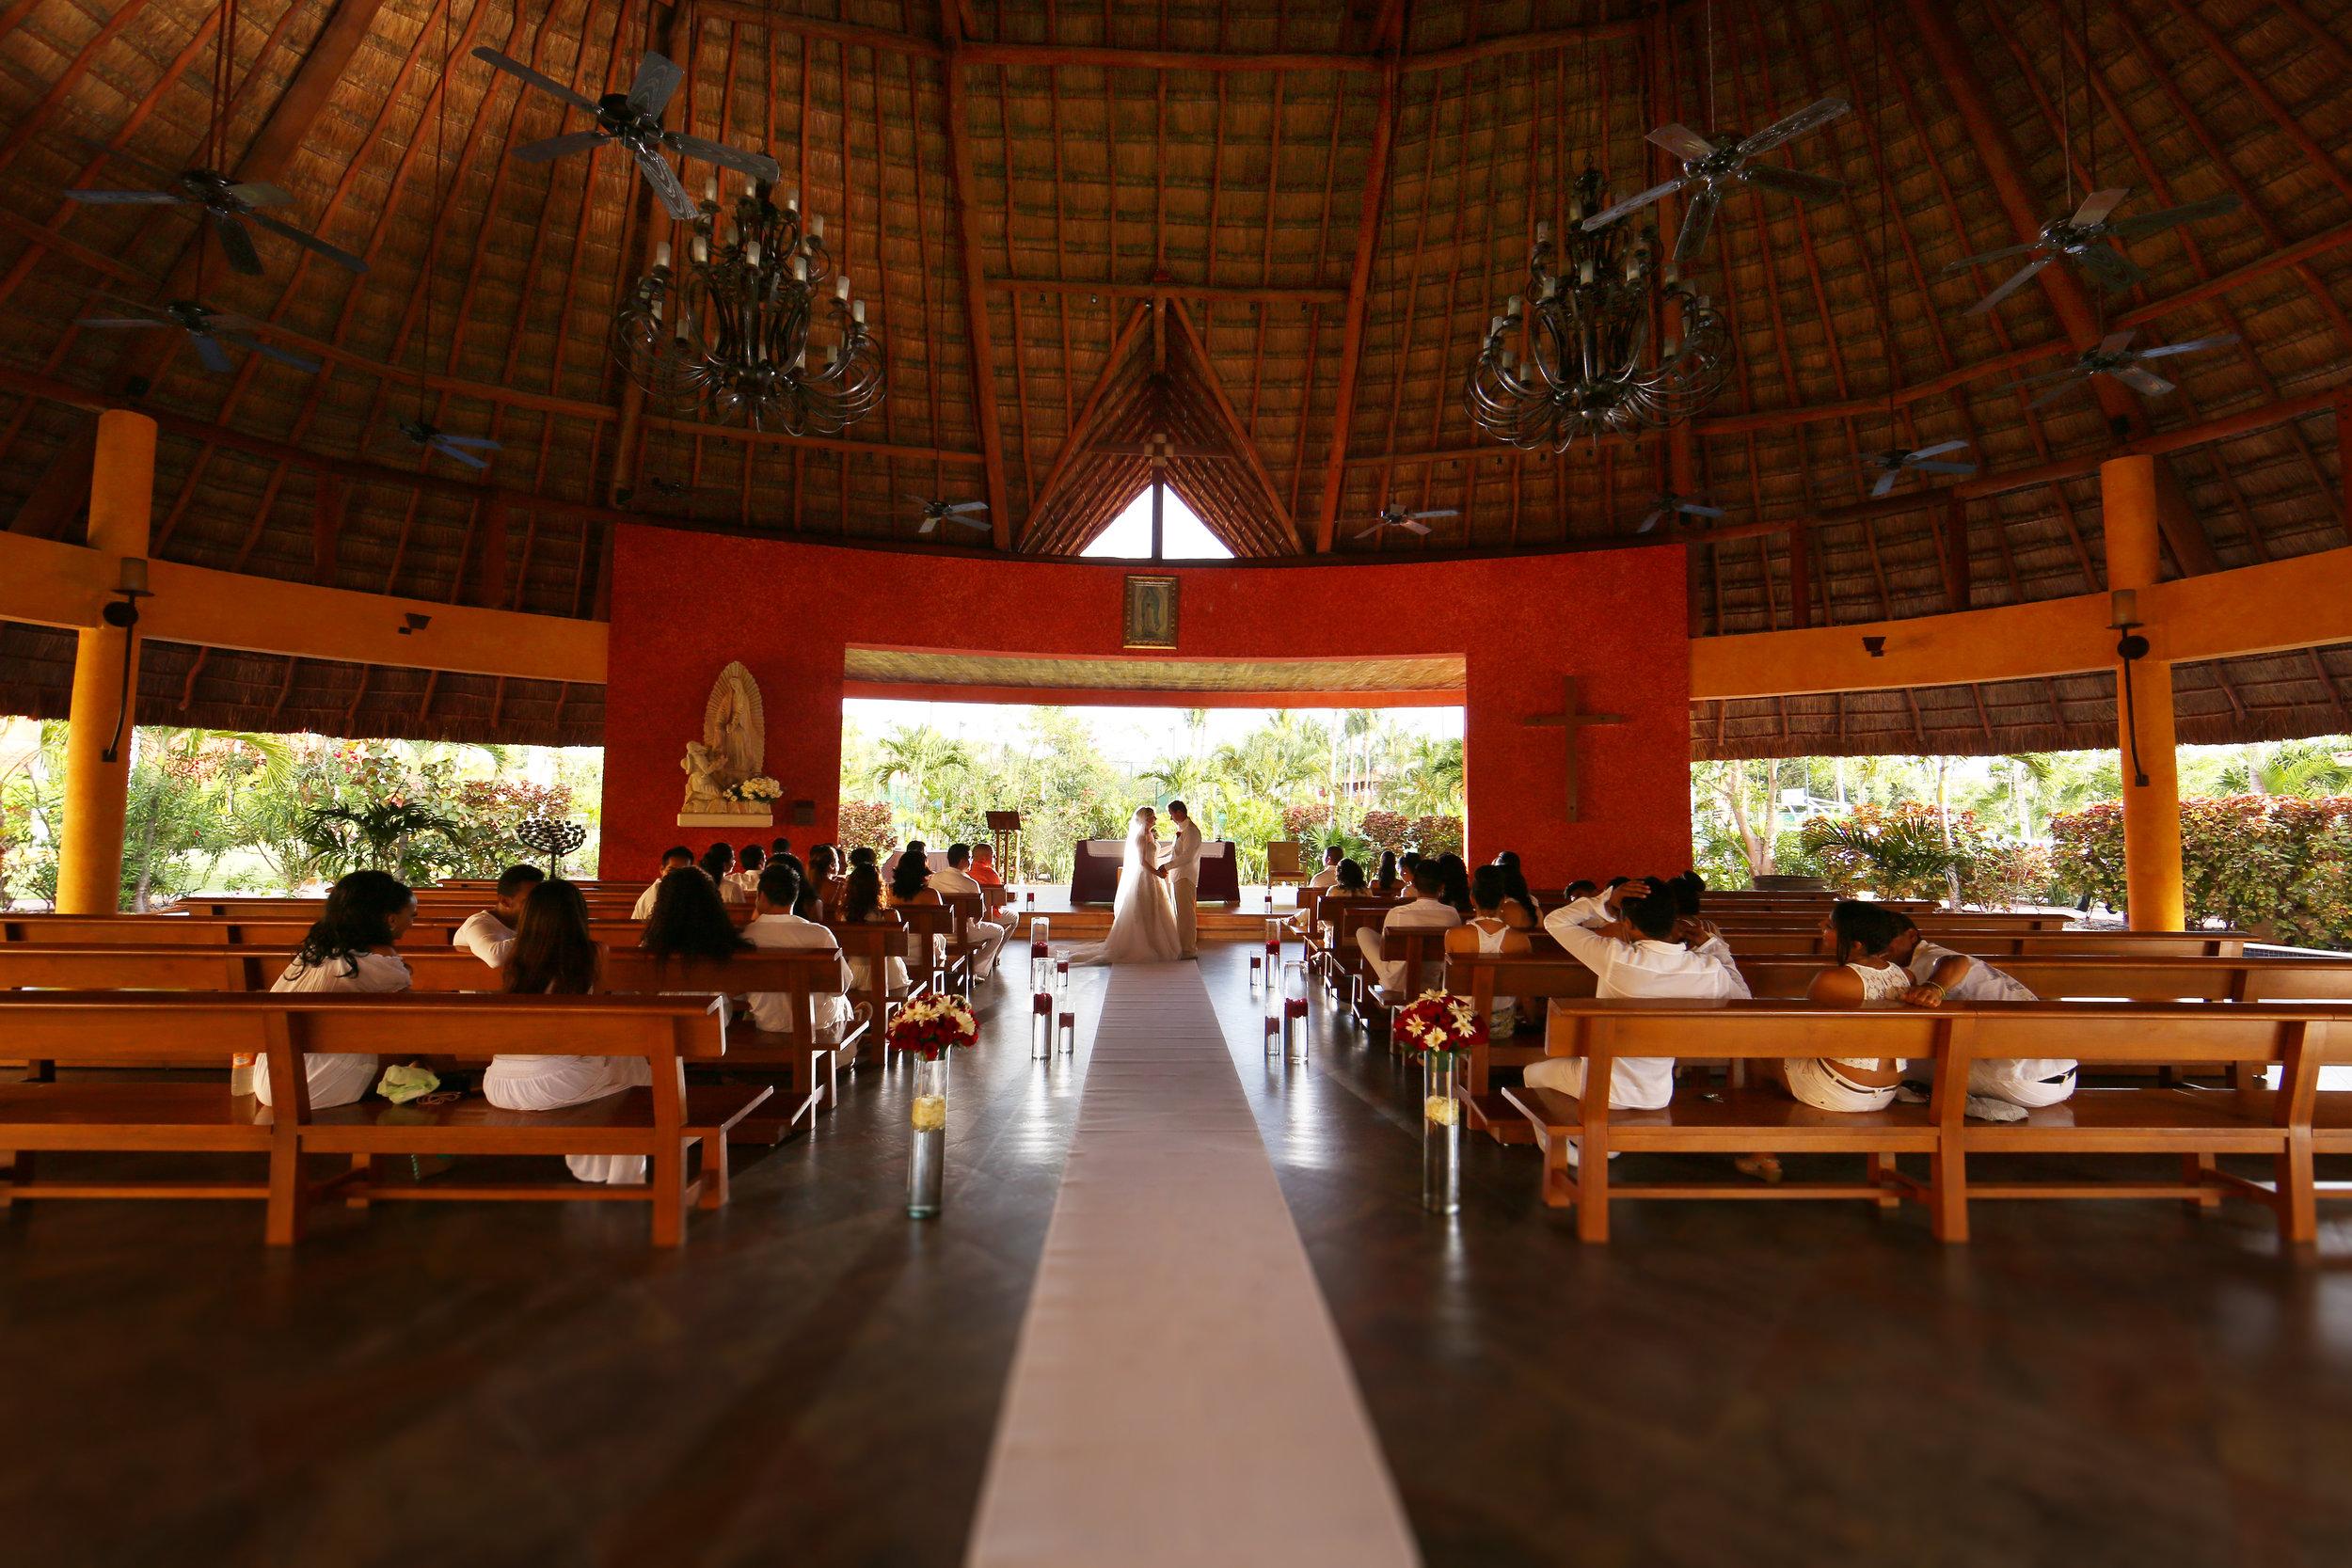 Catholic wedding in Mexico